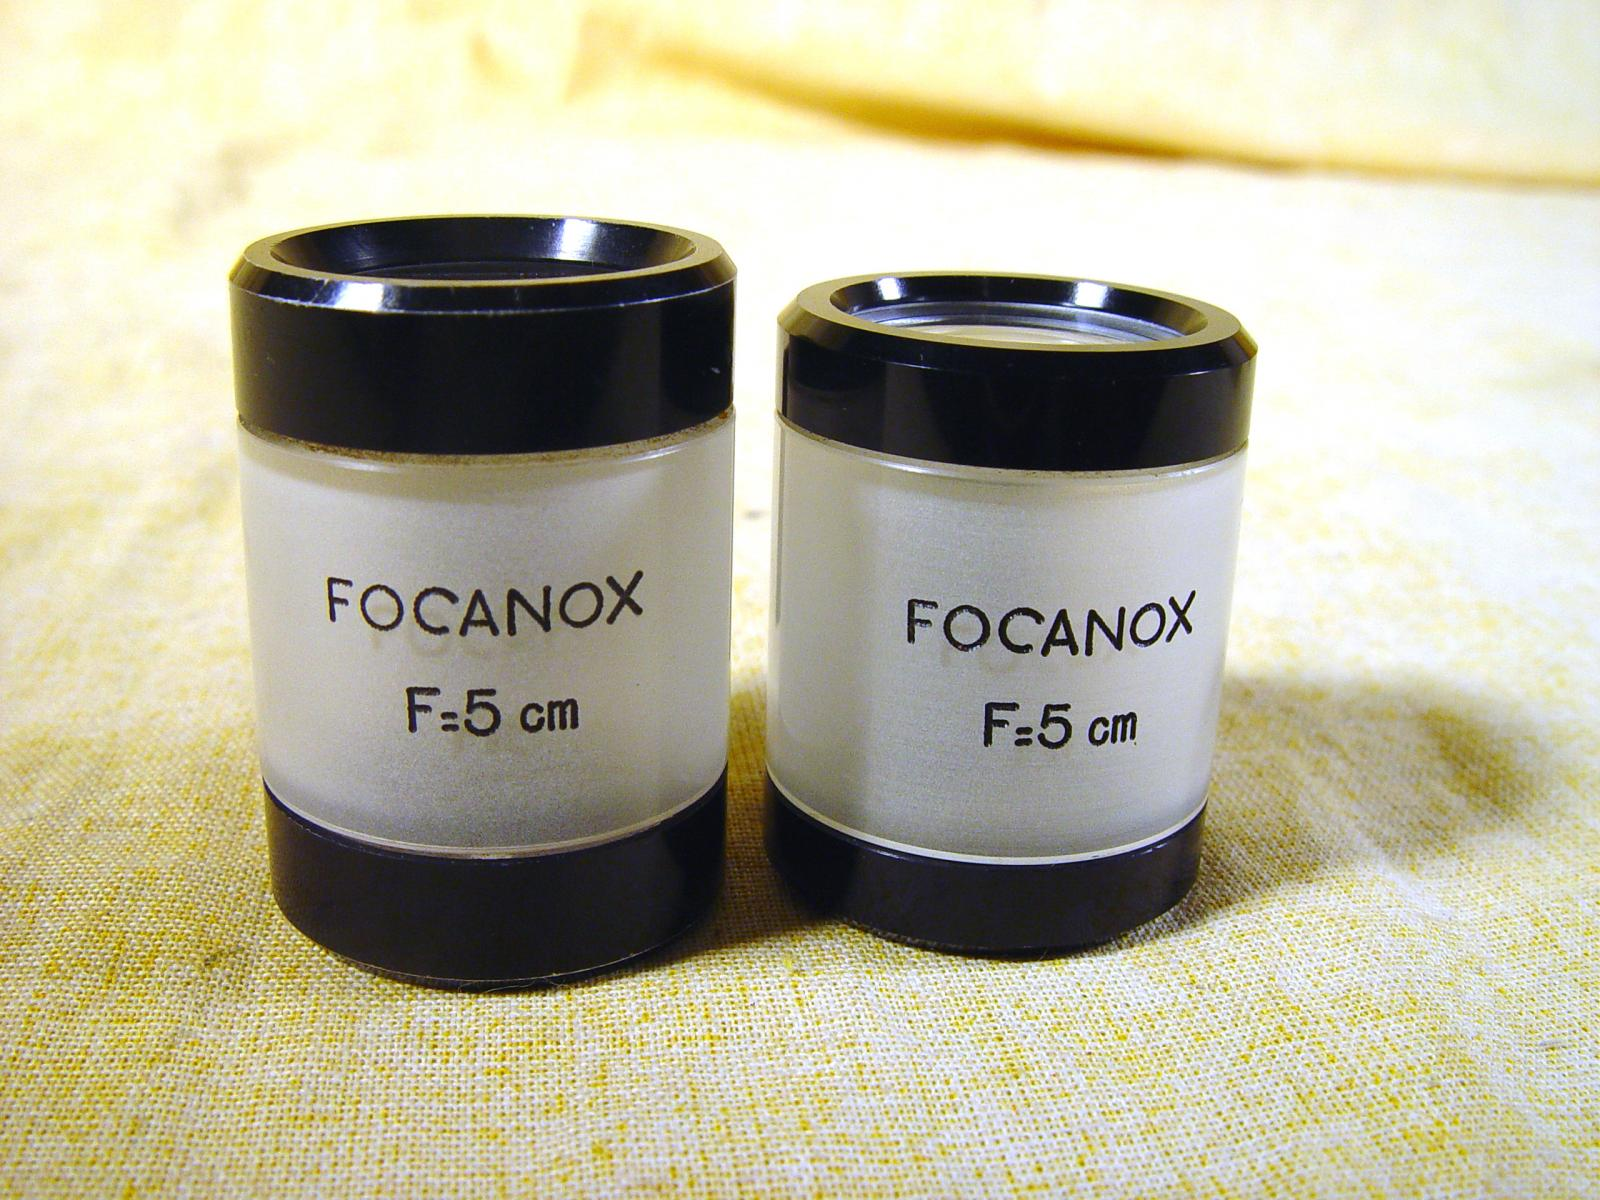 Wallpaper 3173-7  OPL viseur focanox modele 1, collection AMI Appareils photos